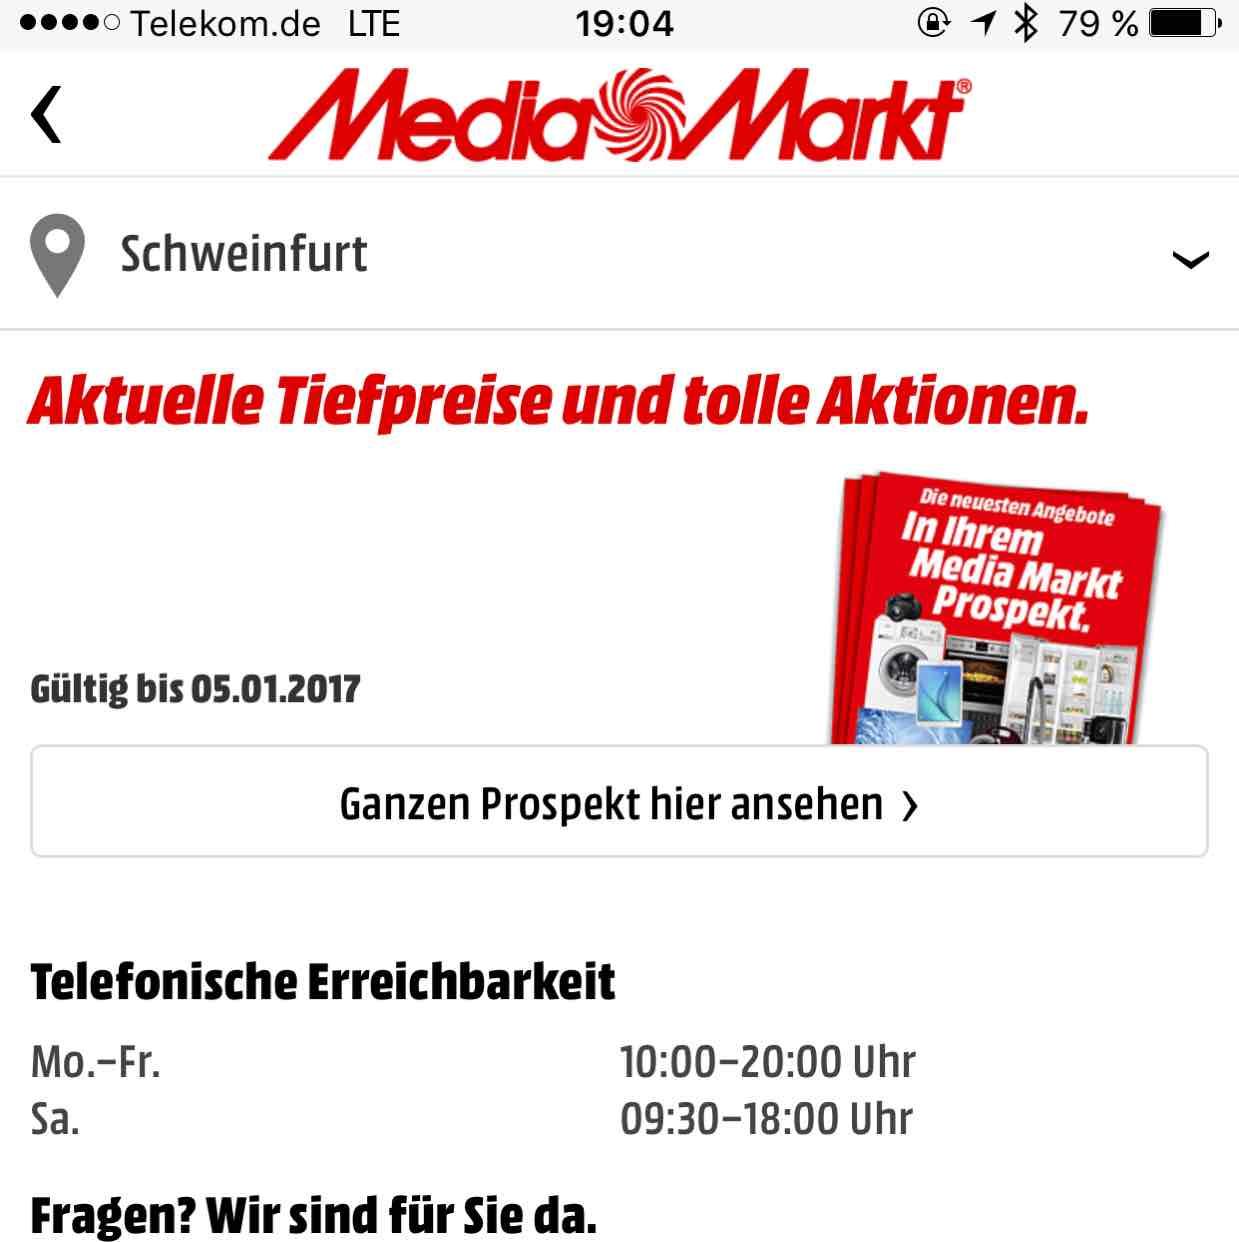 Media Markt schweinfurt // Sony 55xd8505 990€ + 100€ Coupon